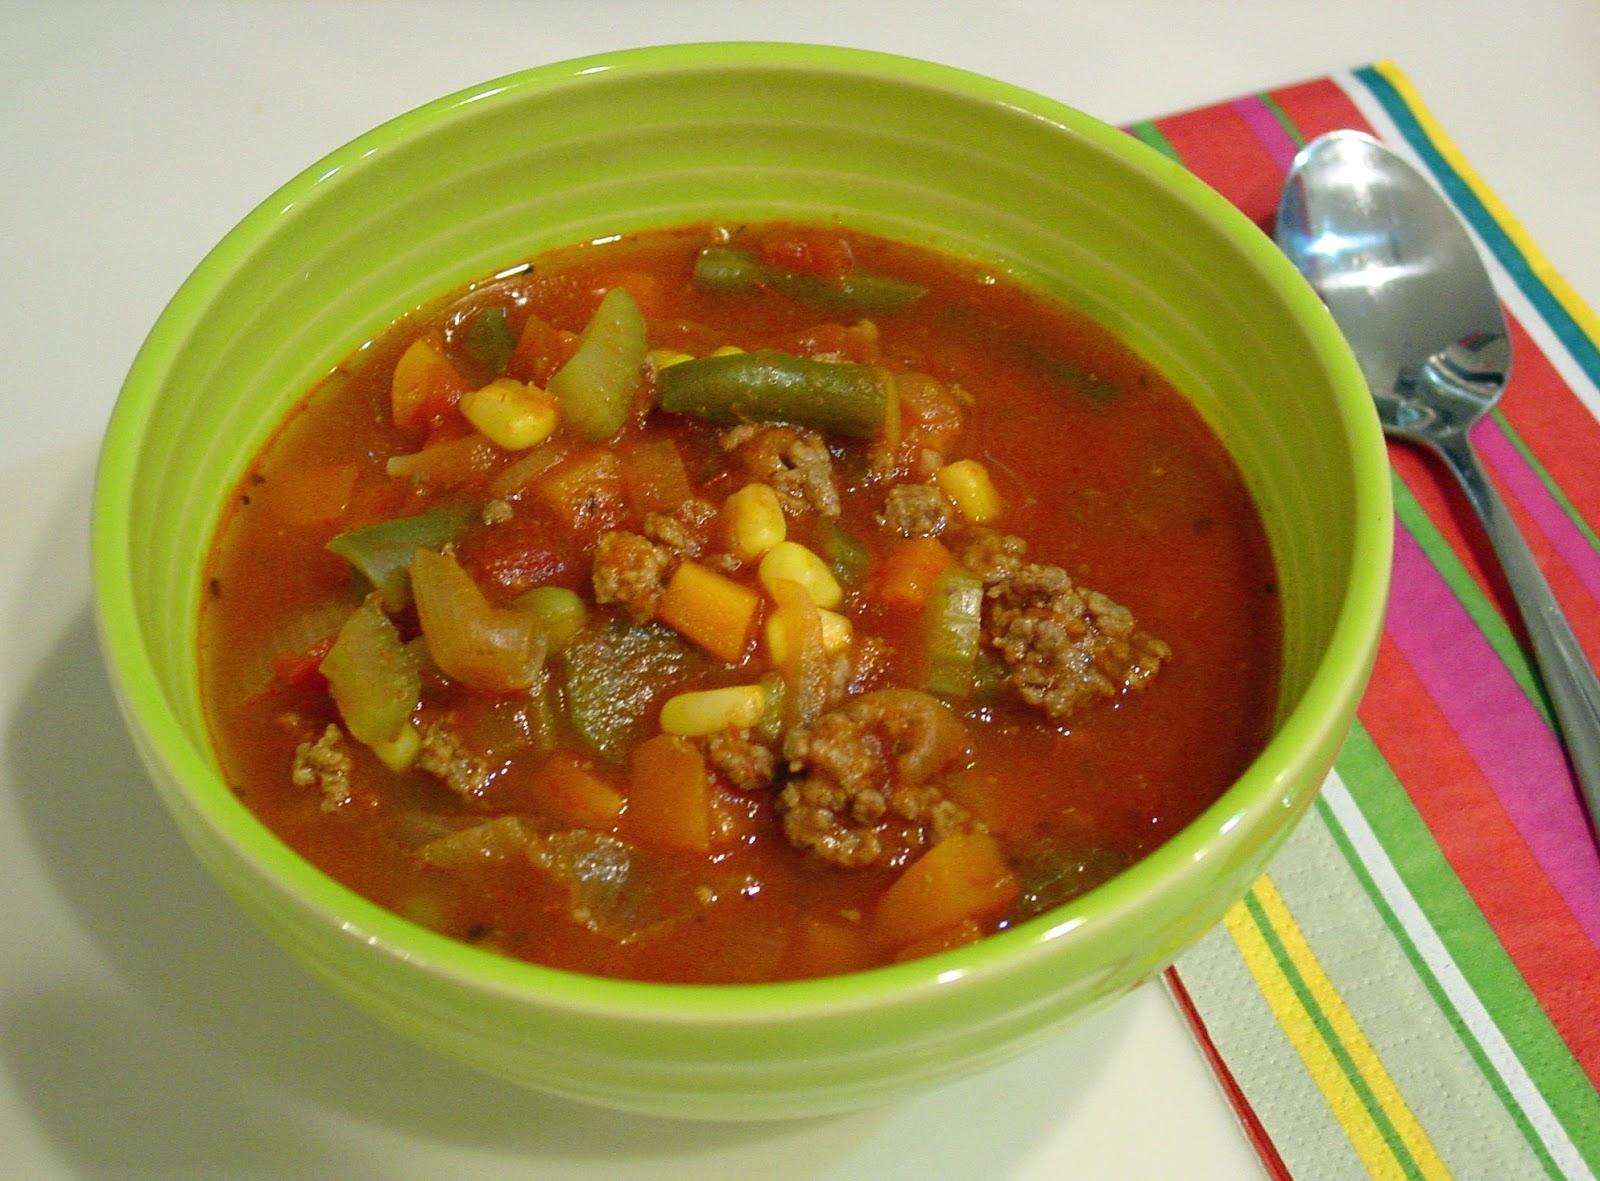 Instant Pot Spicy Beef Vegetable Soup